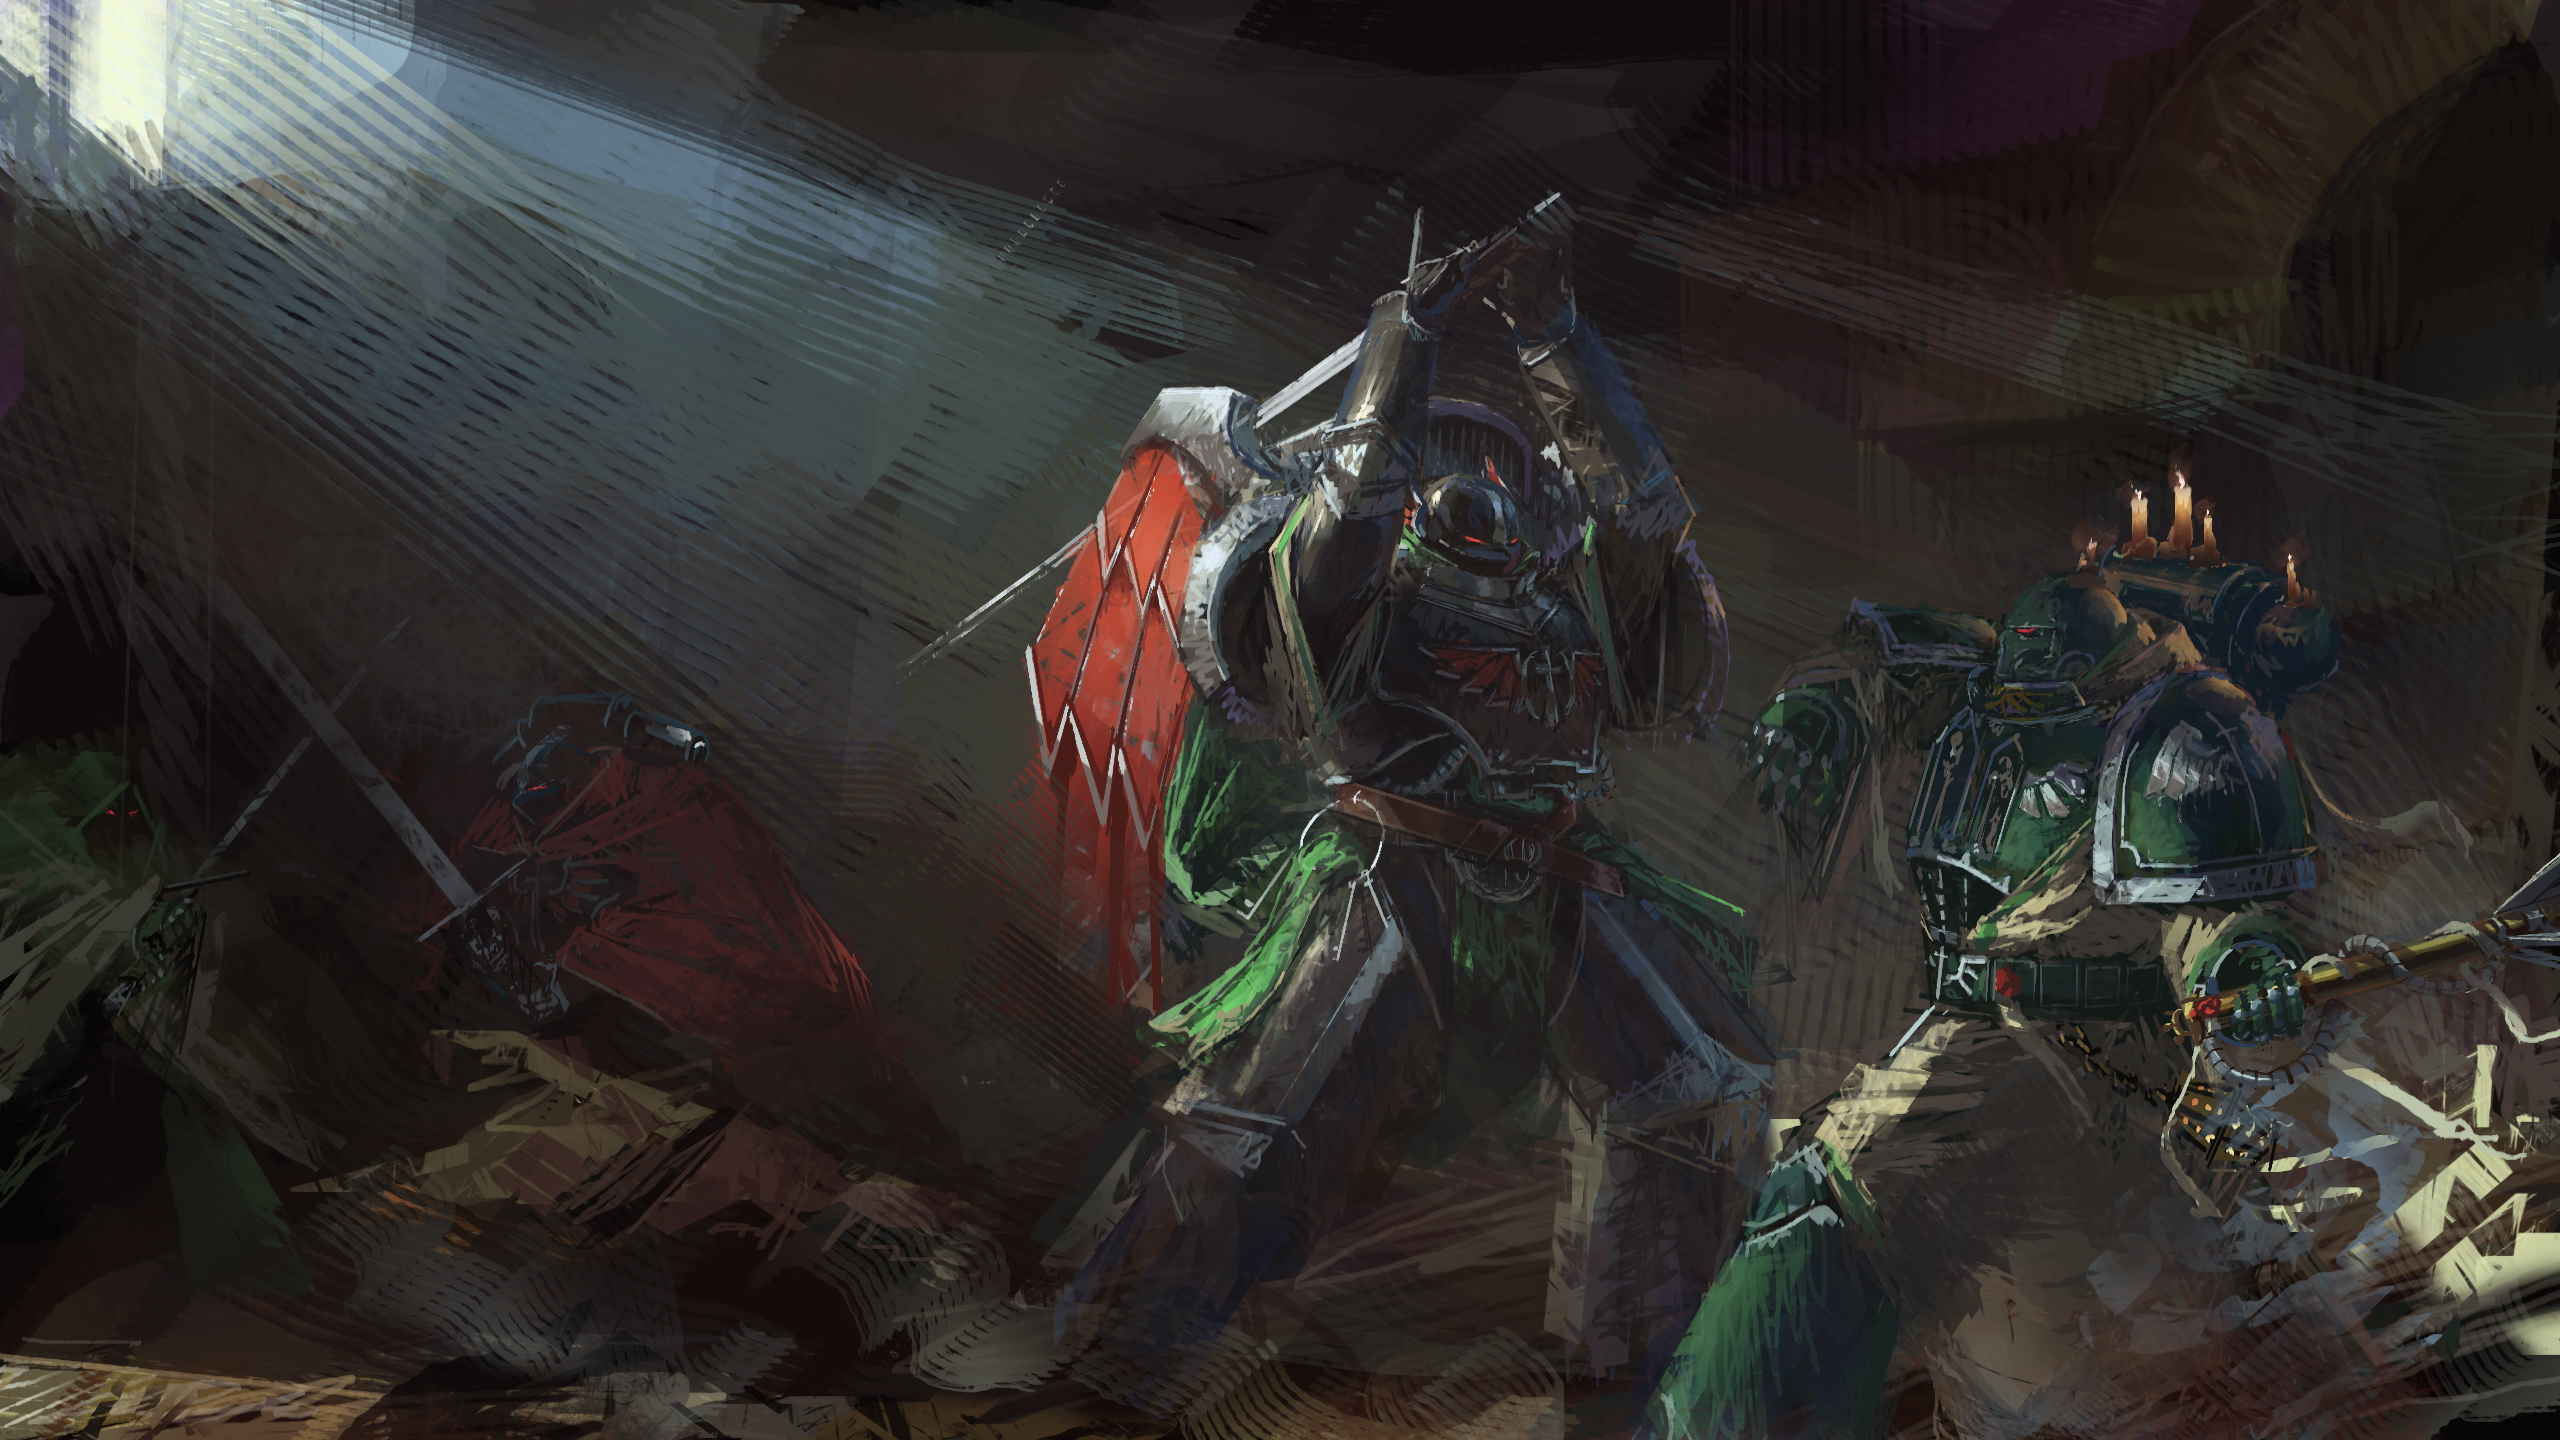 Artwork Warhammer 40k Hd Games 4k Wallpapers Images